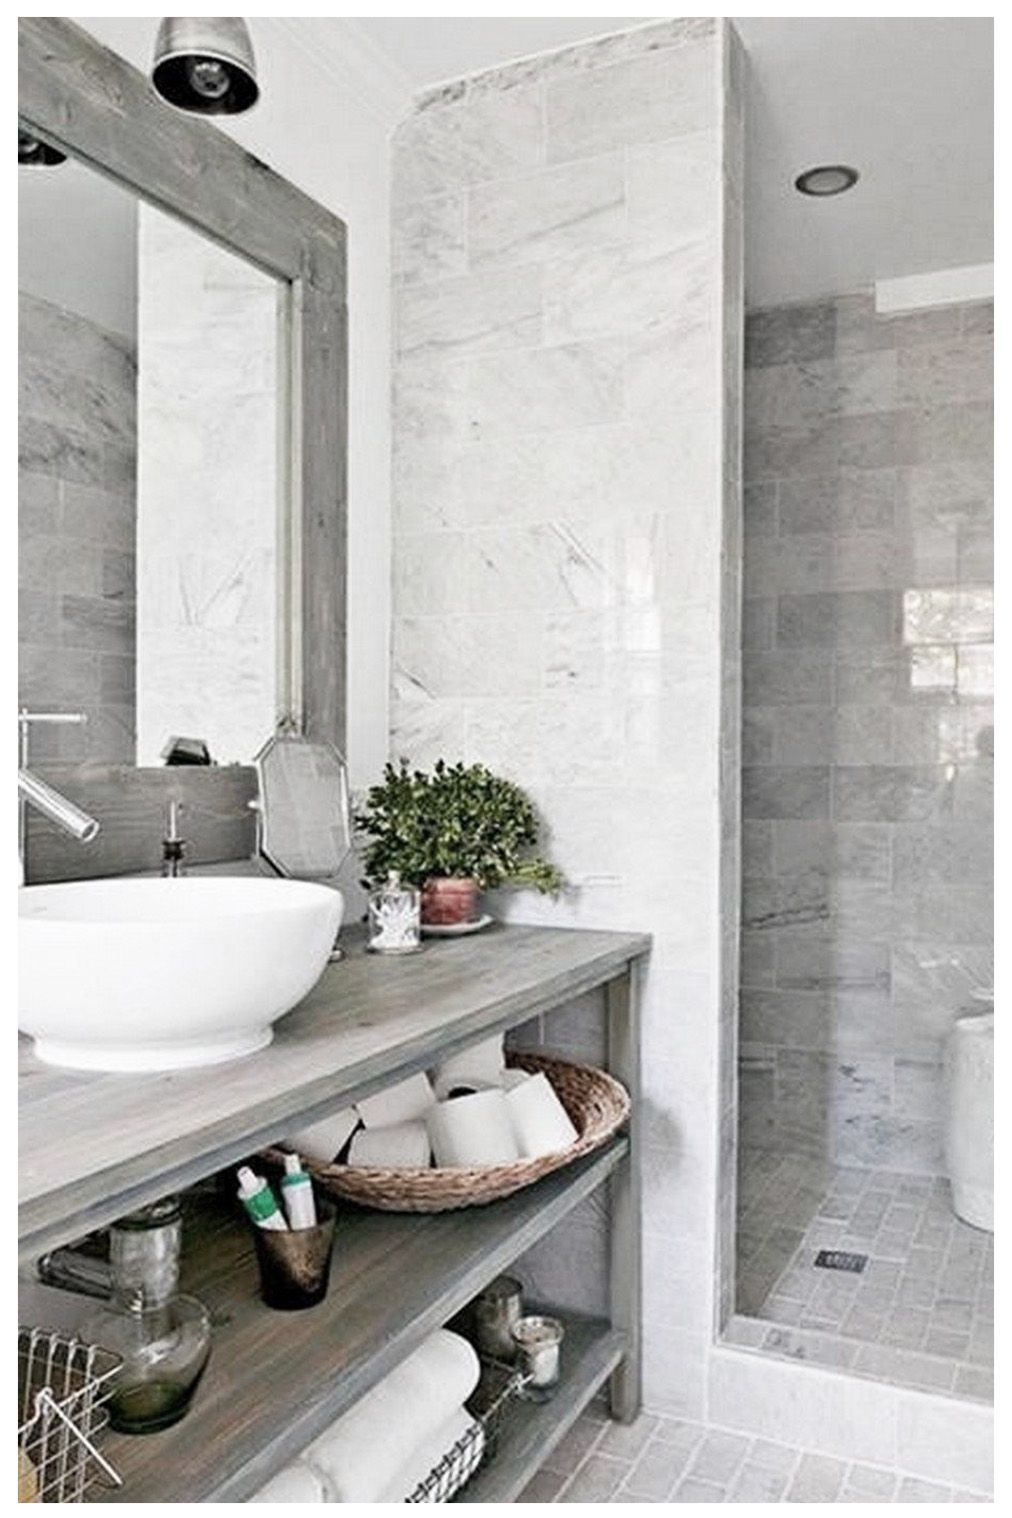 20 Gorgeous Bathroom Flooring Design 2020 Tips Ideas In 2020 Bathroom Renovation Diy Small Bathroom Simple Small Bathroom Designs